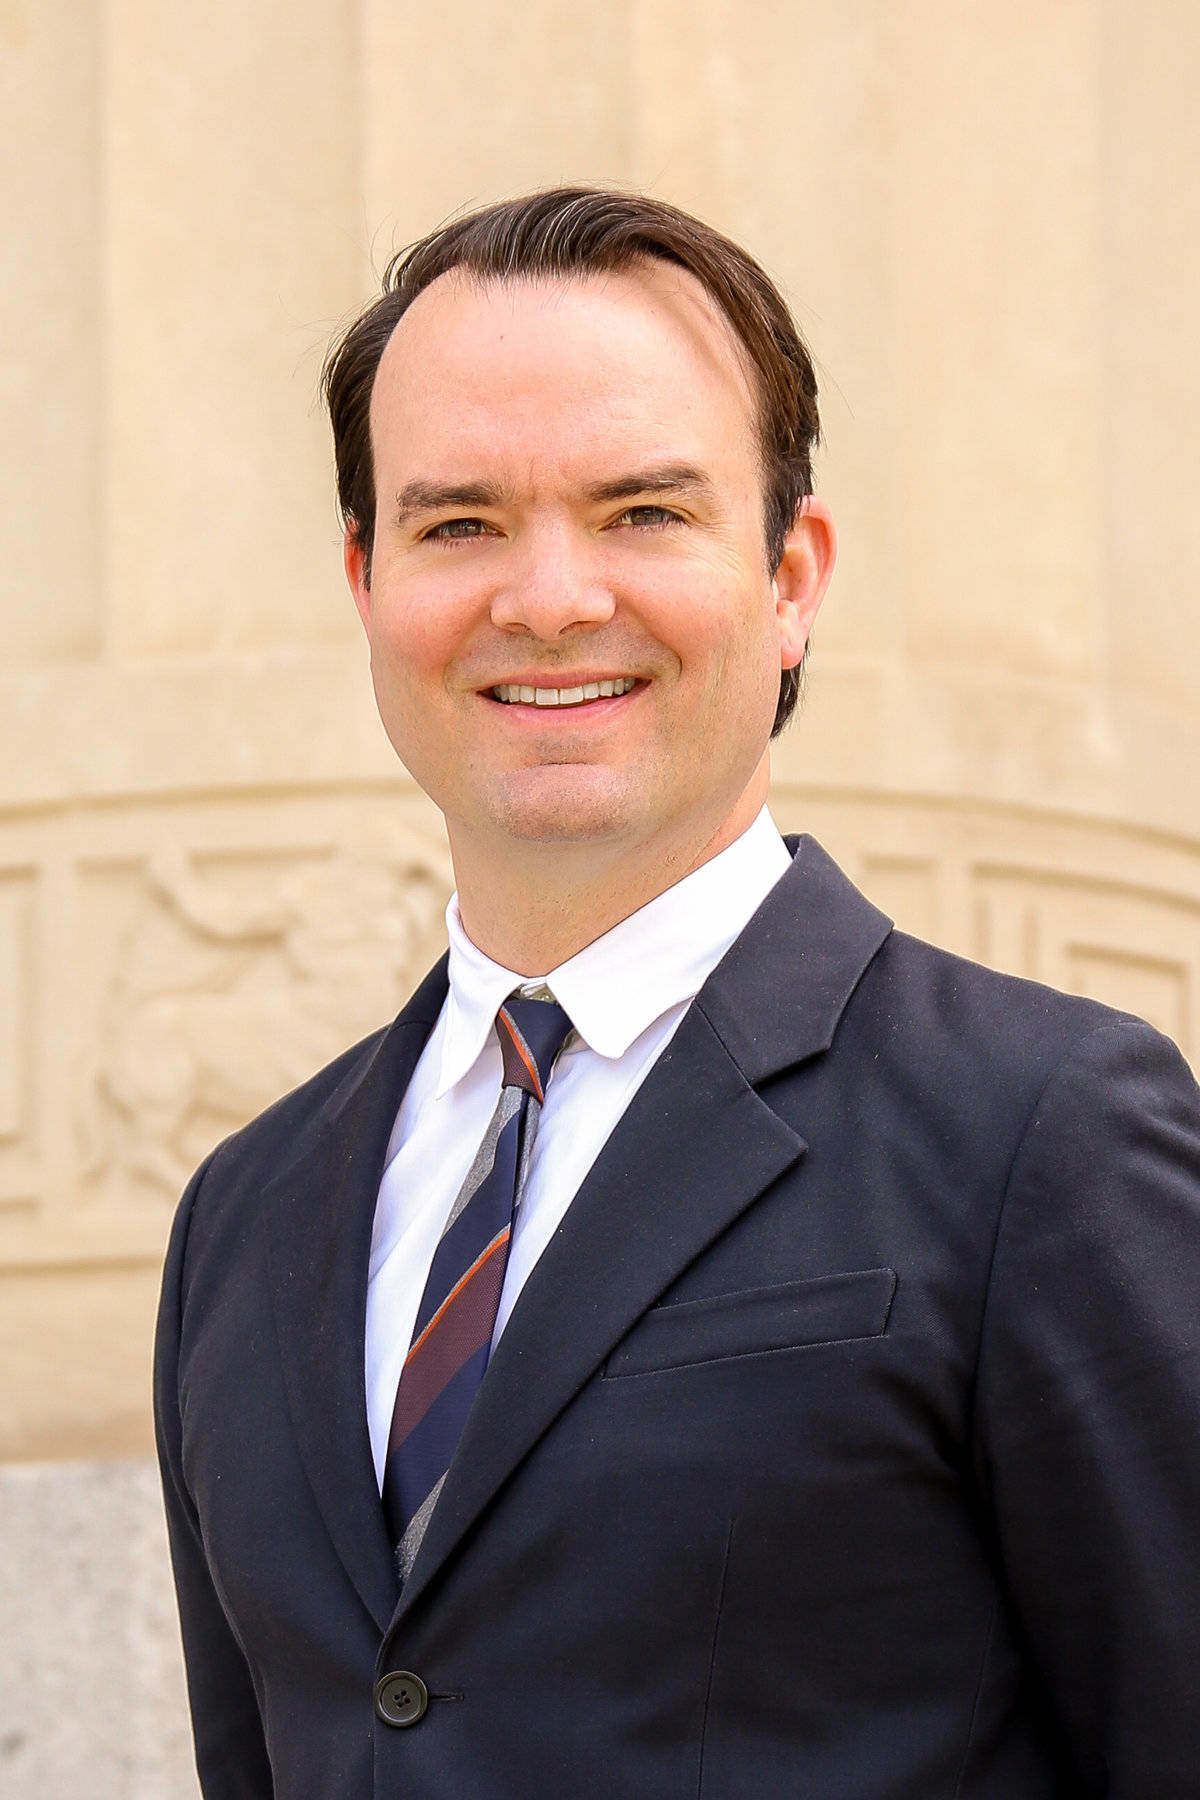 Samuel Vail